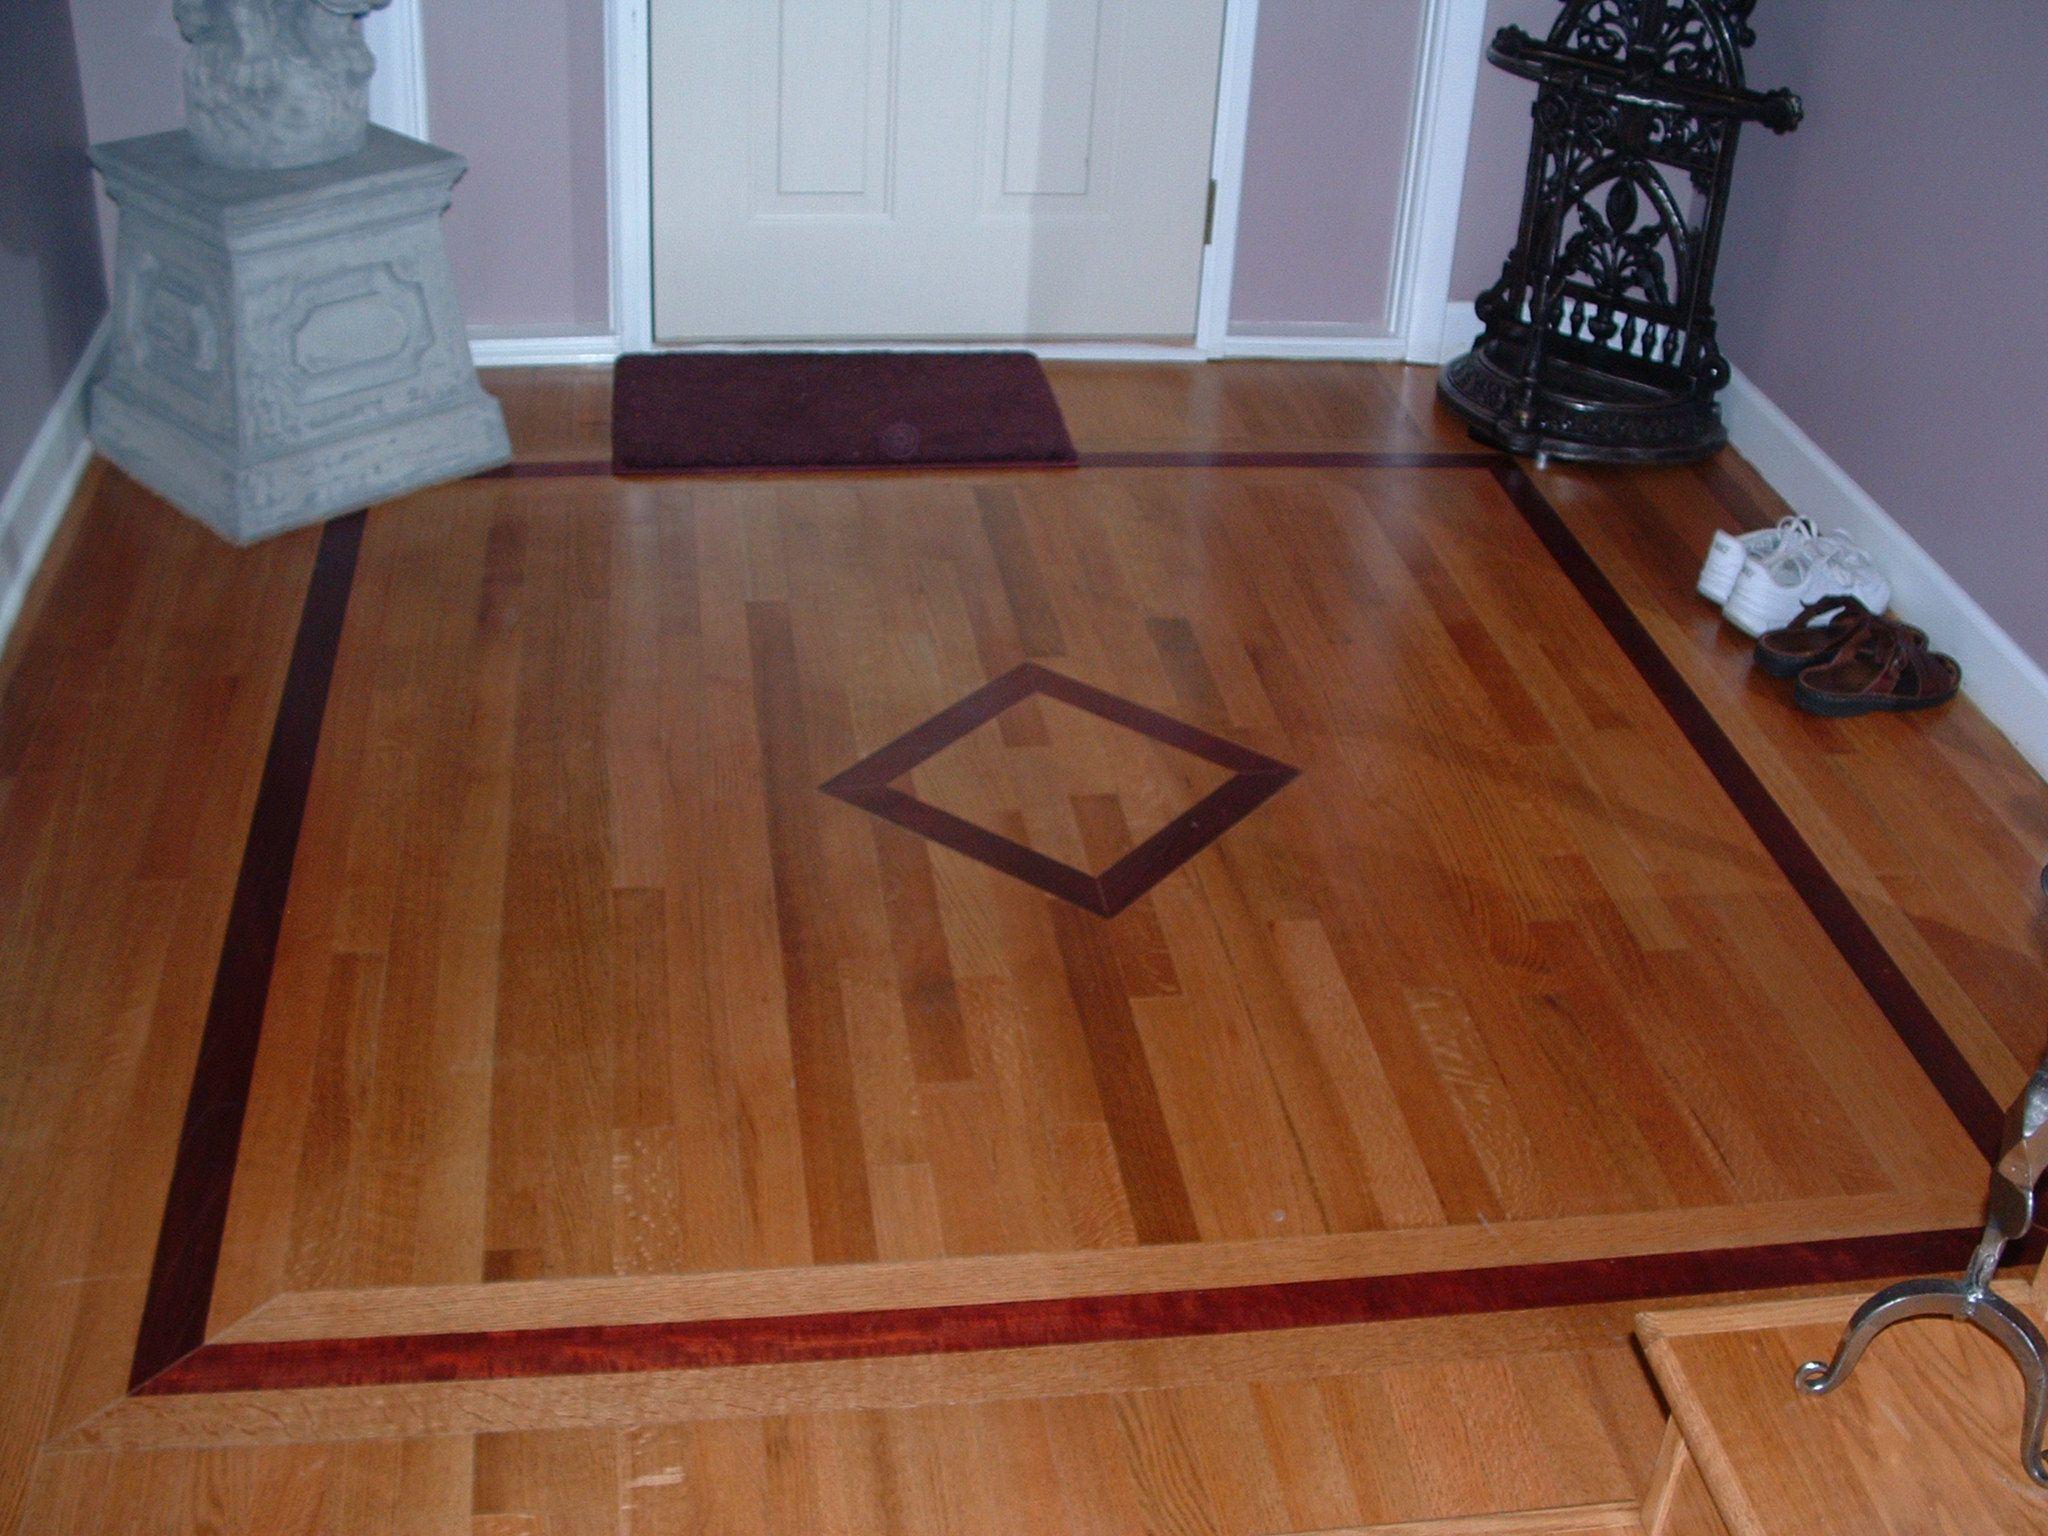 wood floor designs Google Search Hardwood floors, Wood